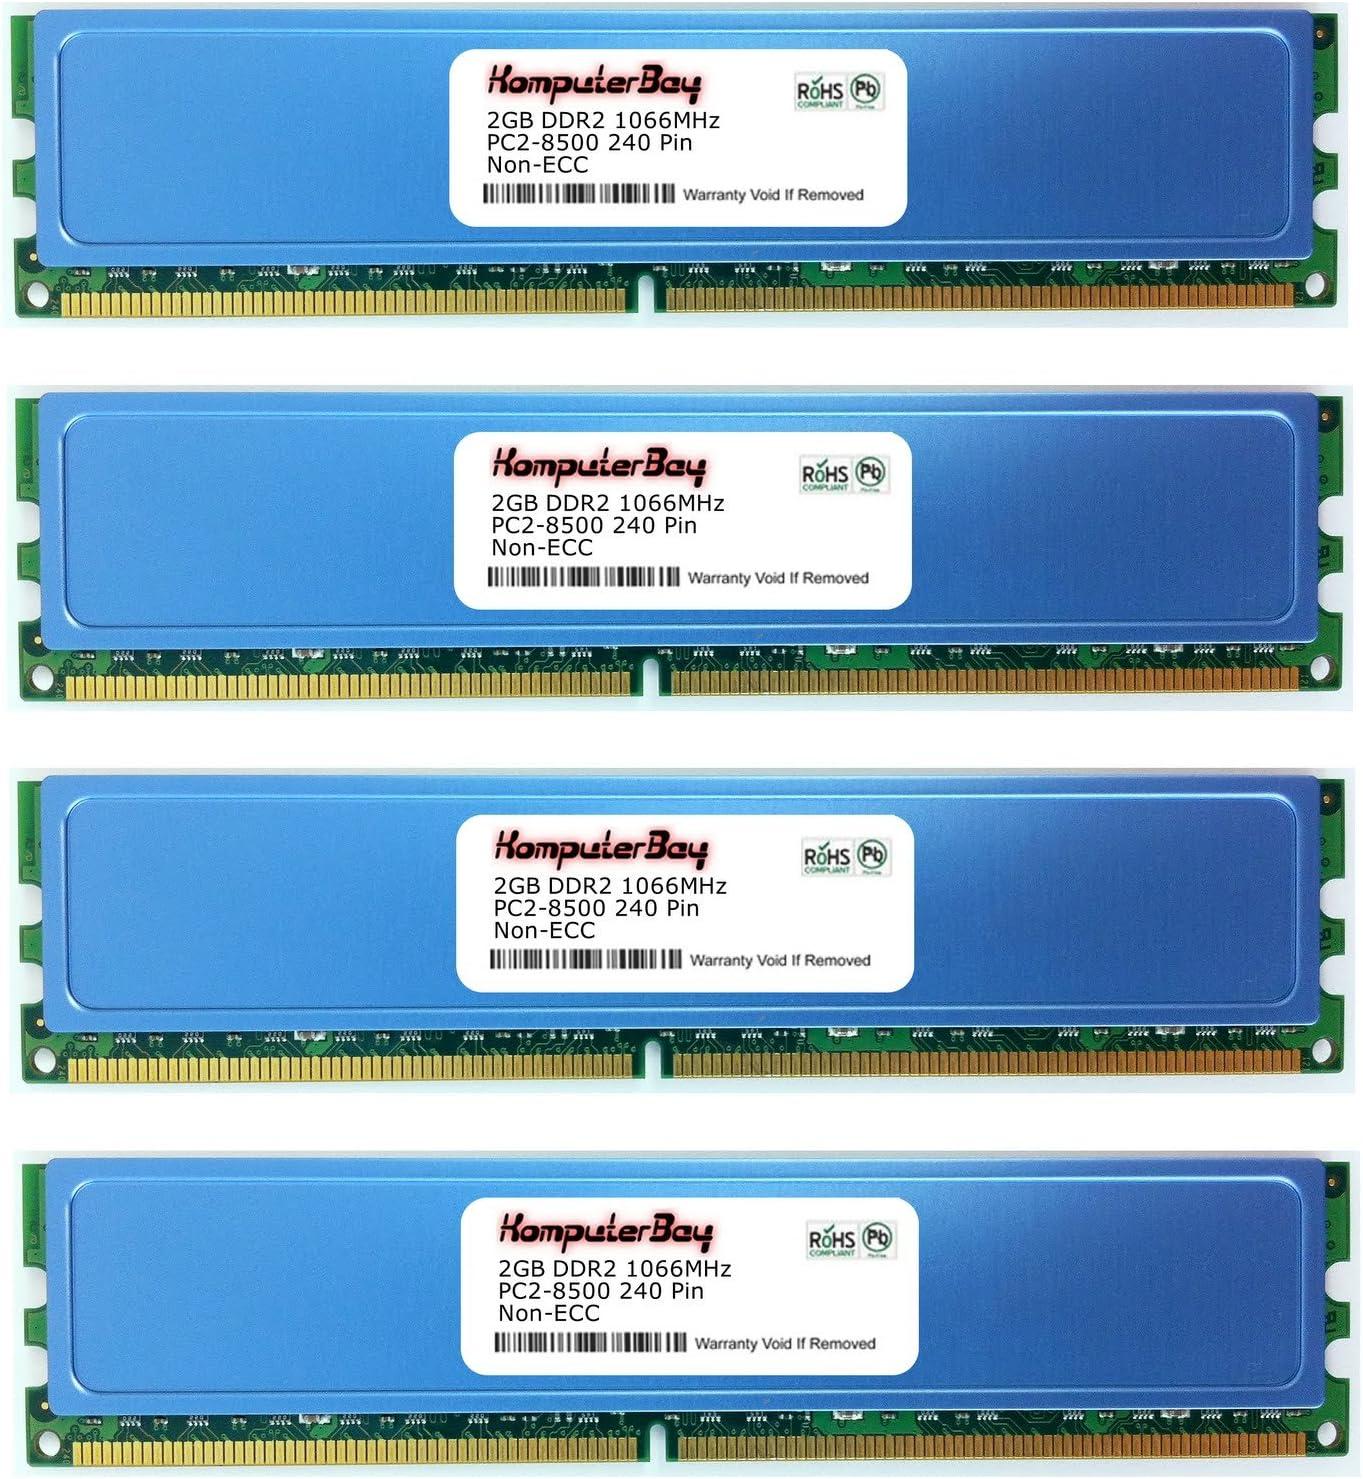 KOMPUTERBAY 8GB DDR2 DIMM 4 X 2GB AM2 1066Mhz PC2 8500 for Gigabyte GA-MA790GP-DS4H 8 GB 240 PIN